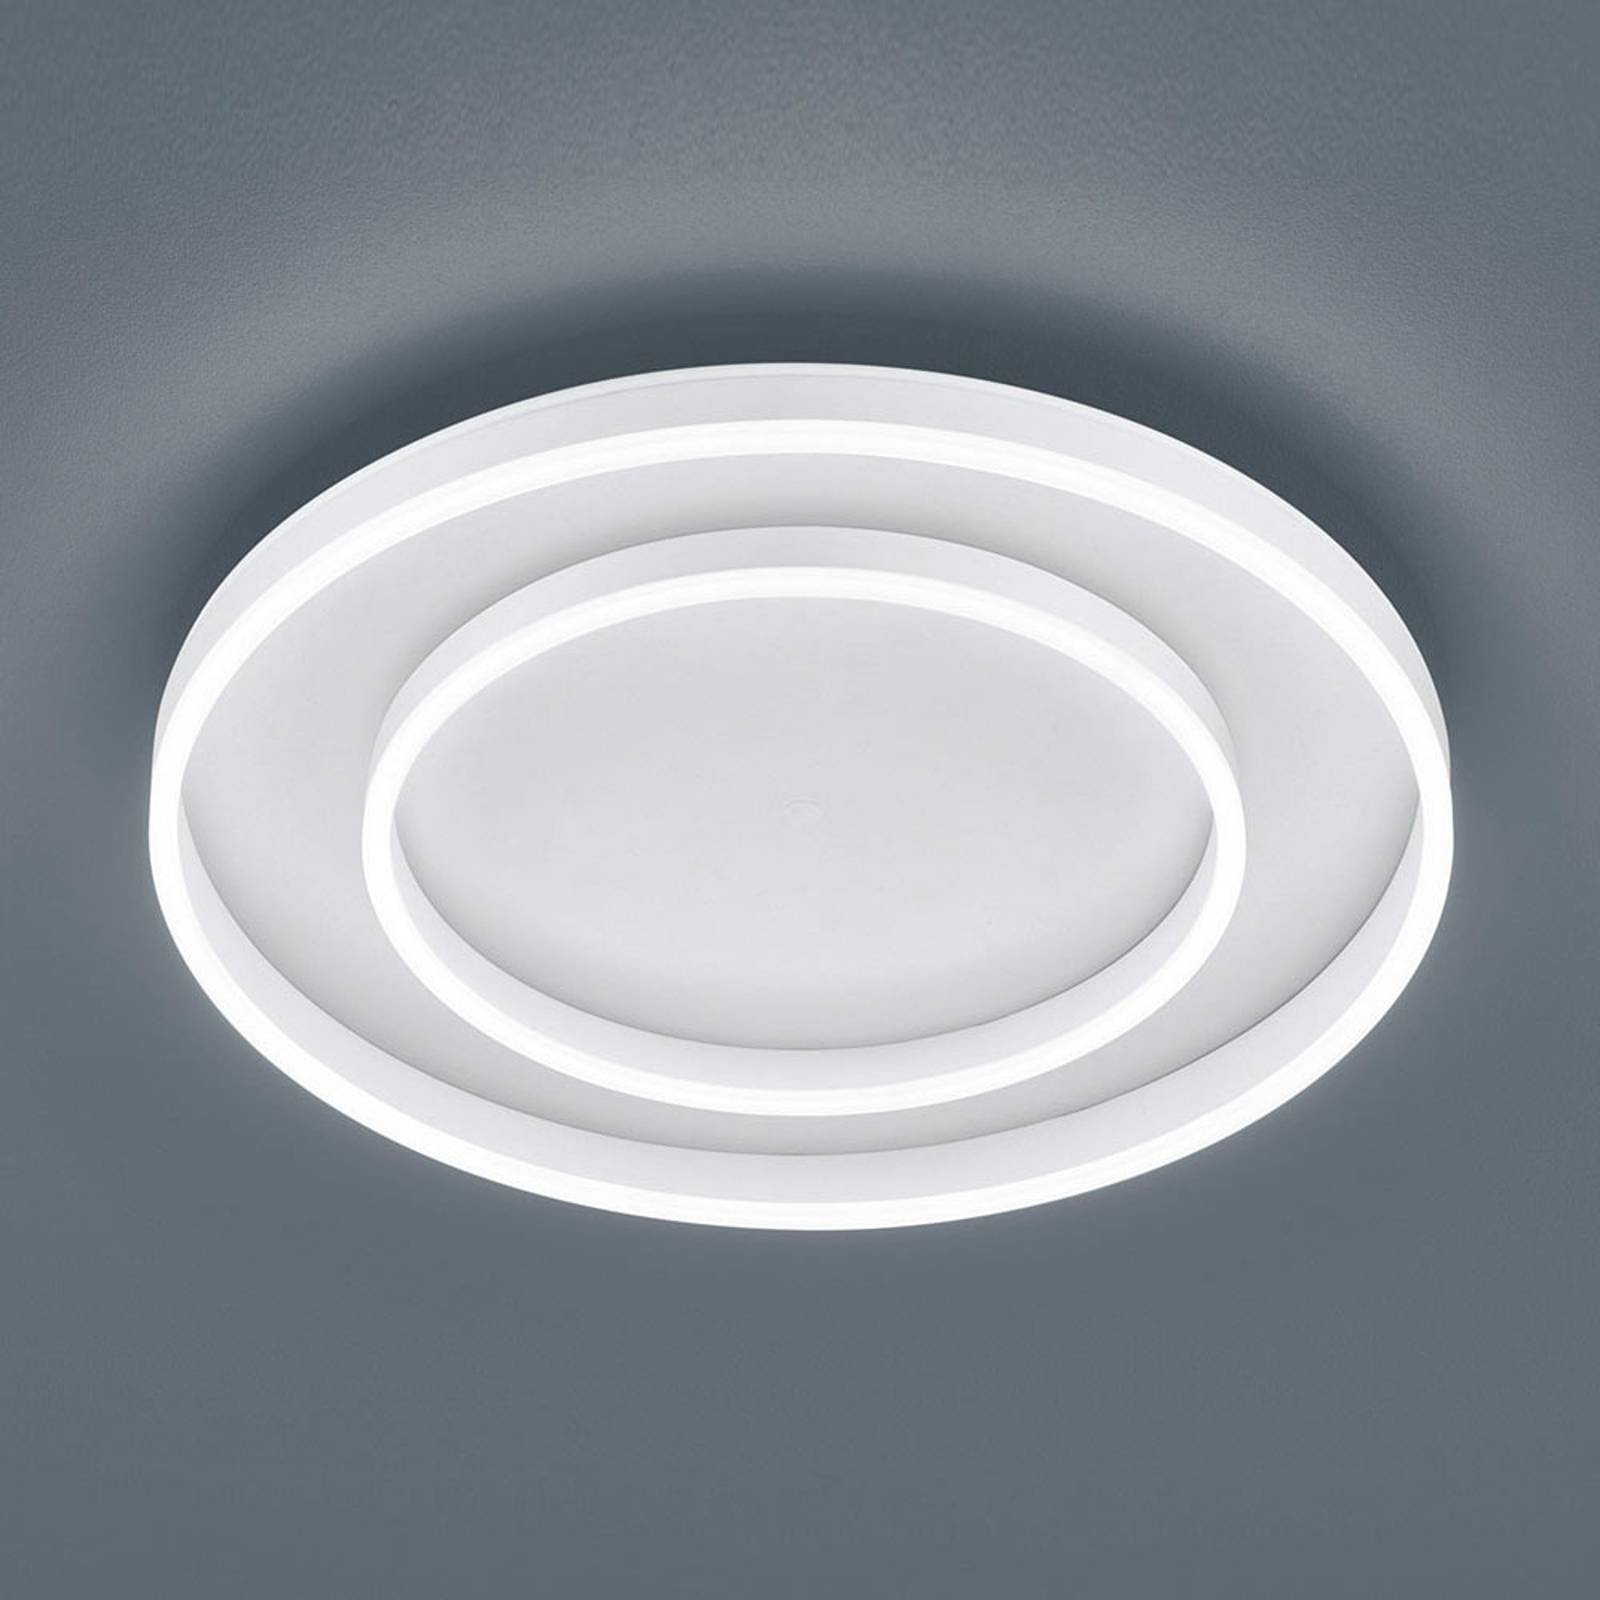 Helestra Sona lampa sufitowa LED Ø60cm biała